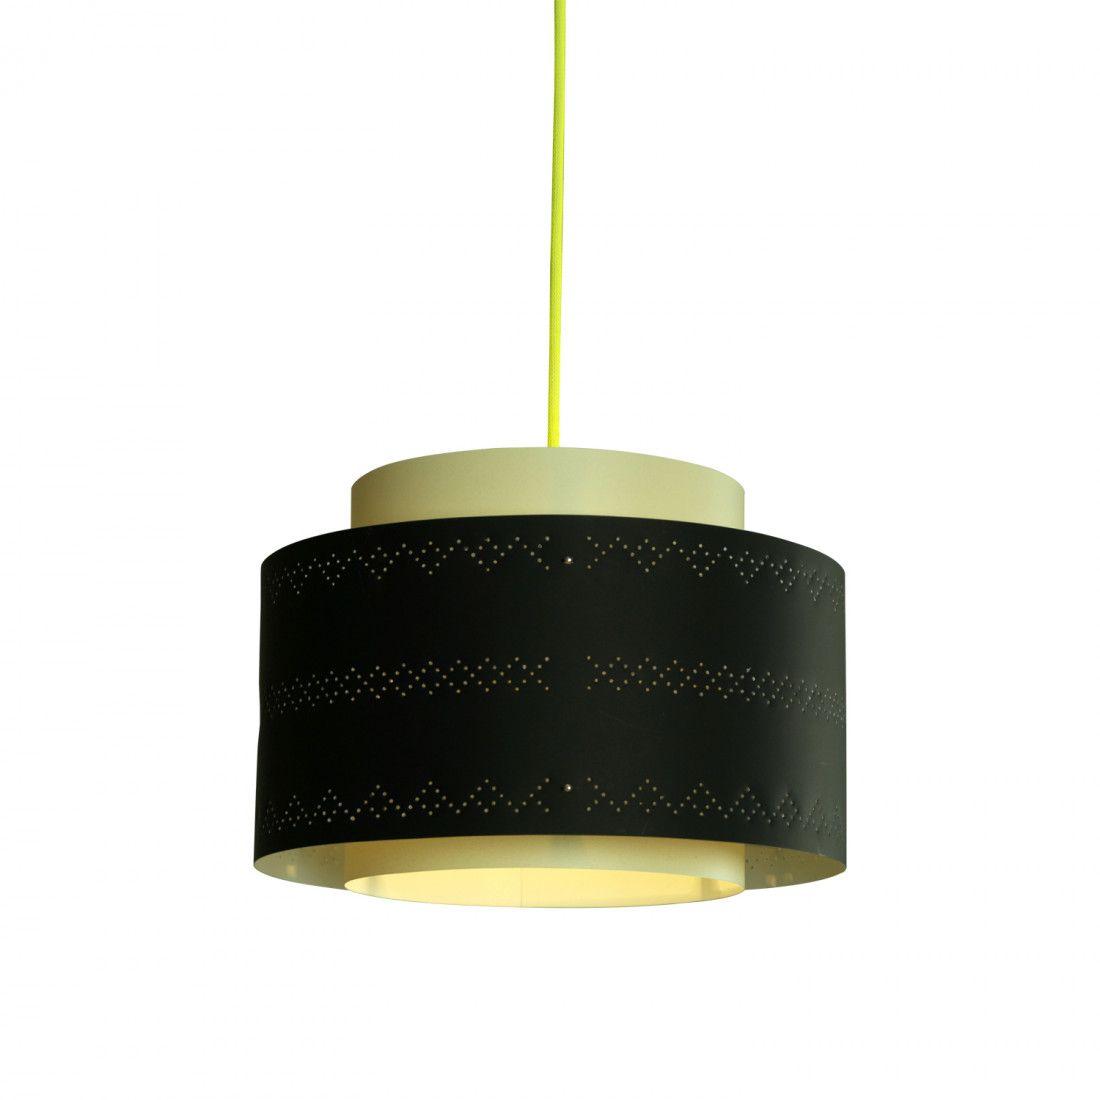 The shaka black beige pendant lamp beige pendants pendant lamps